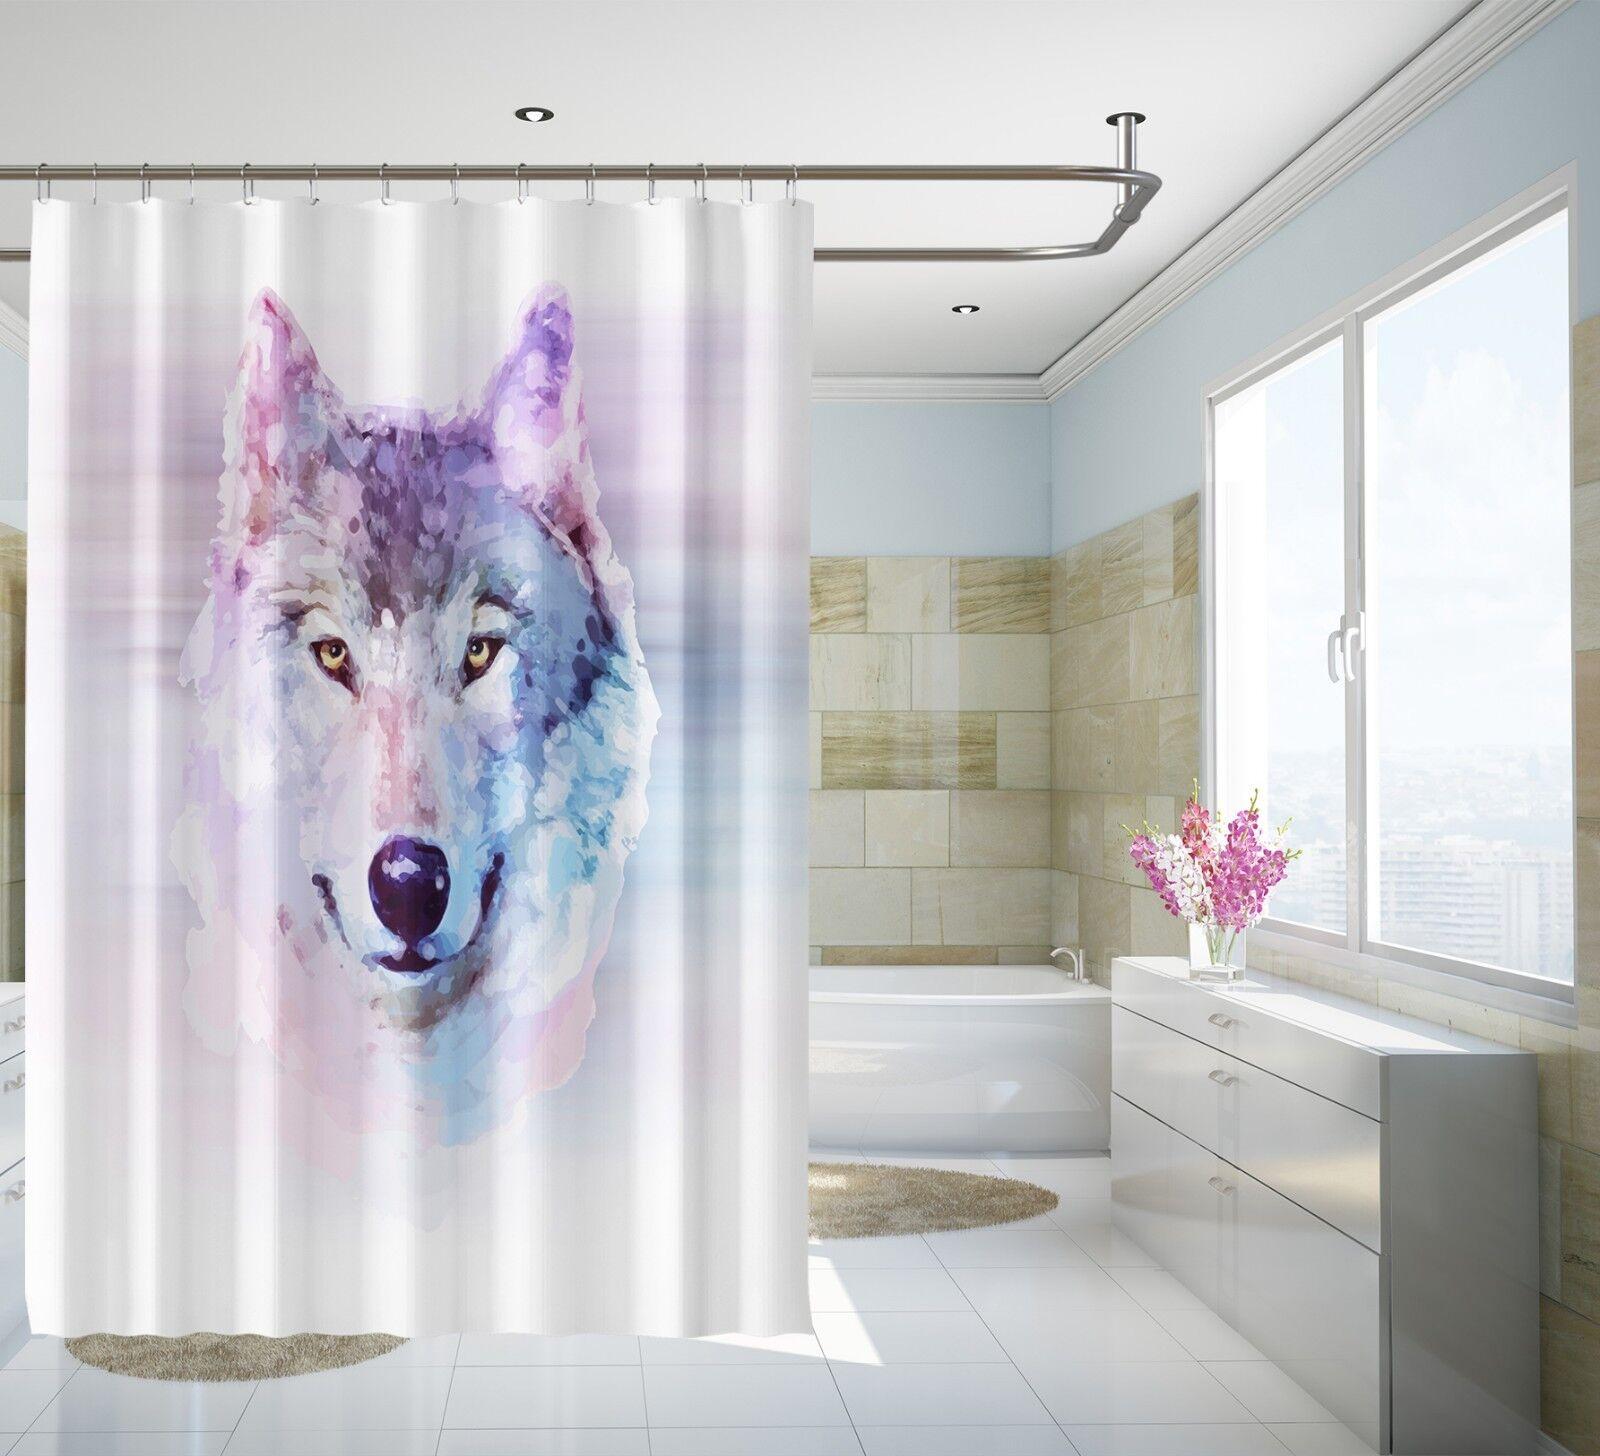 3D Tier Wolf 65 Duschvorhang Wasserdicht Faser Bad Daheim Windows Toilette DE | Hohe Qualität